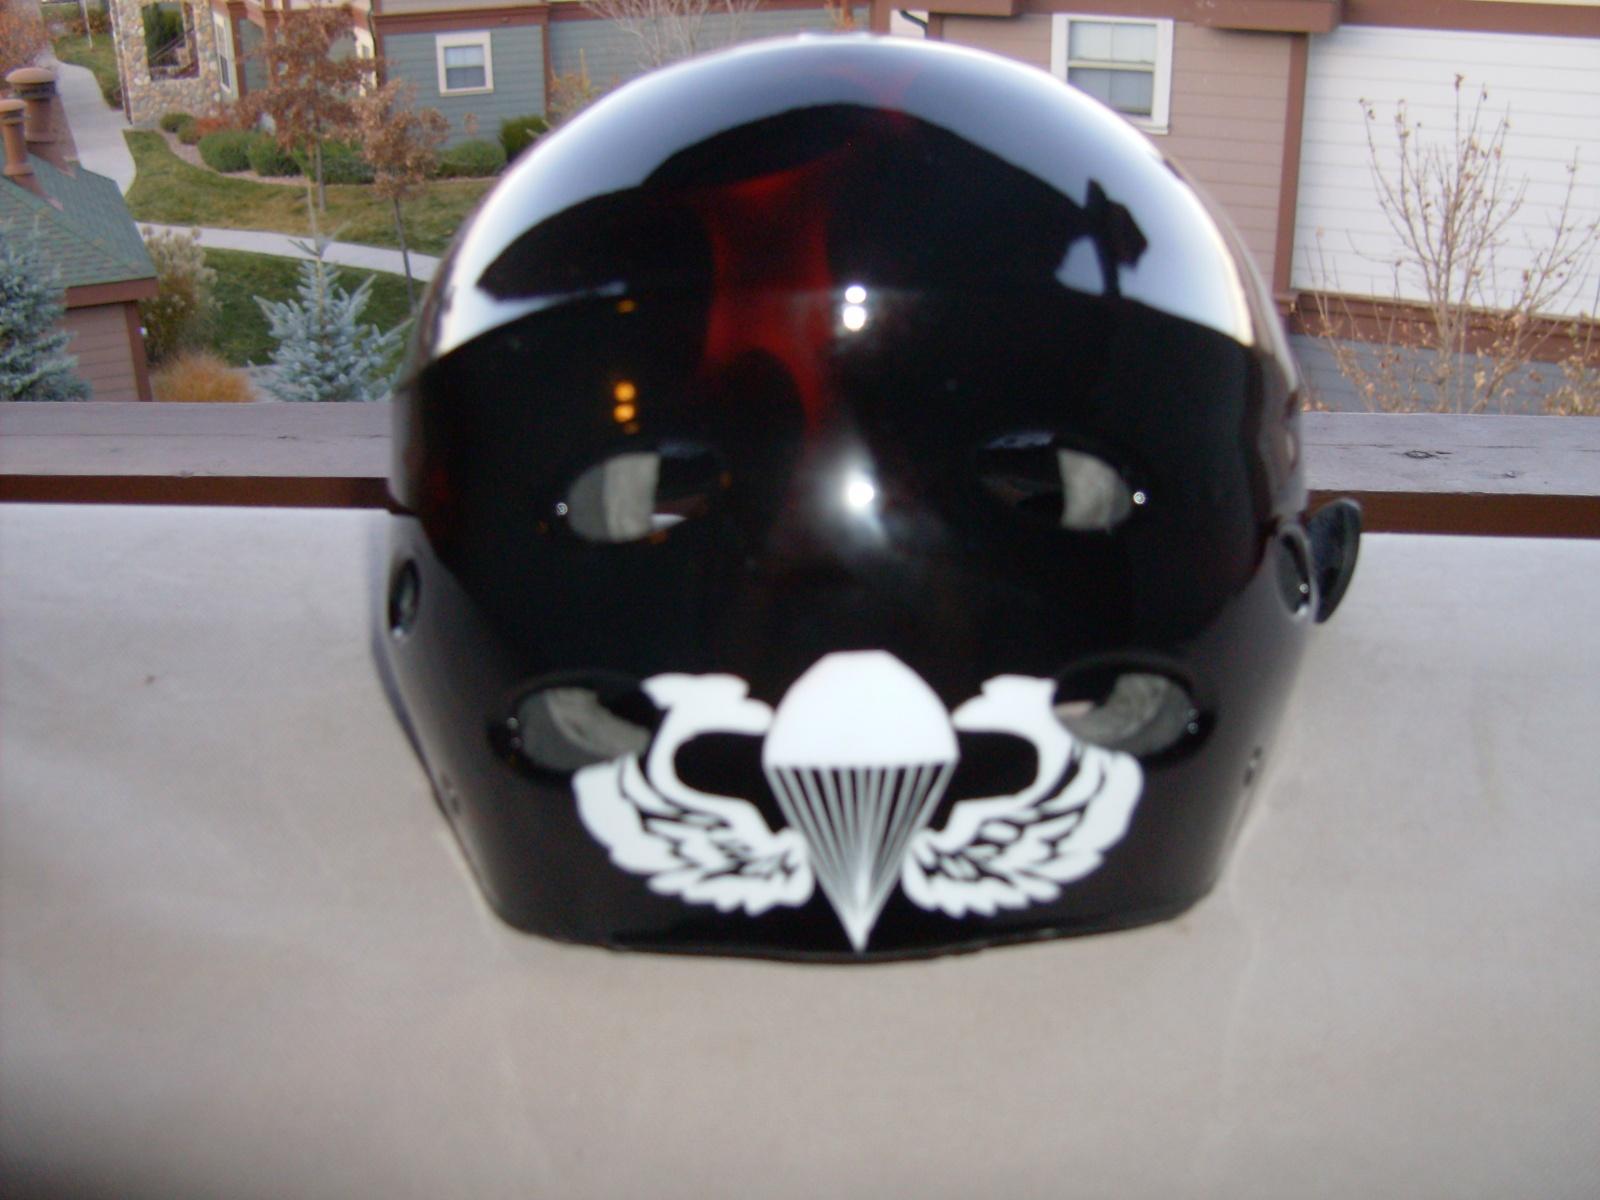 Click image for larger version  Name:Custom kayak helmet 006.jpg Views:356 Size:406.5 KB ID:849